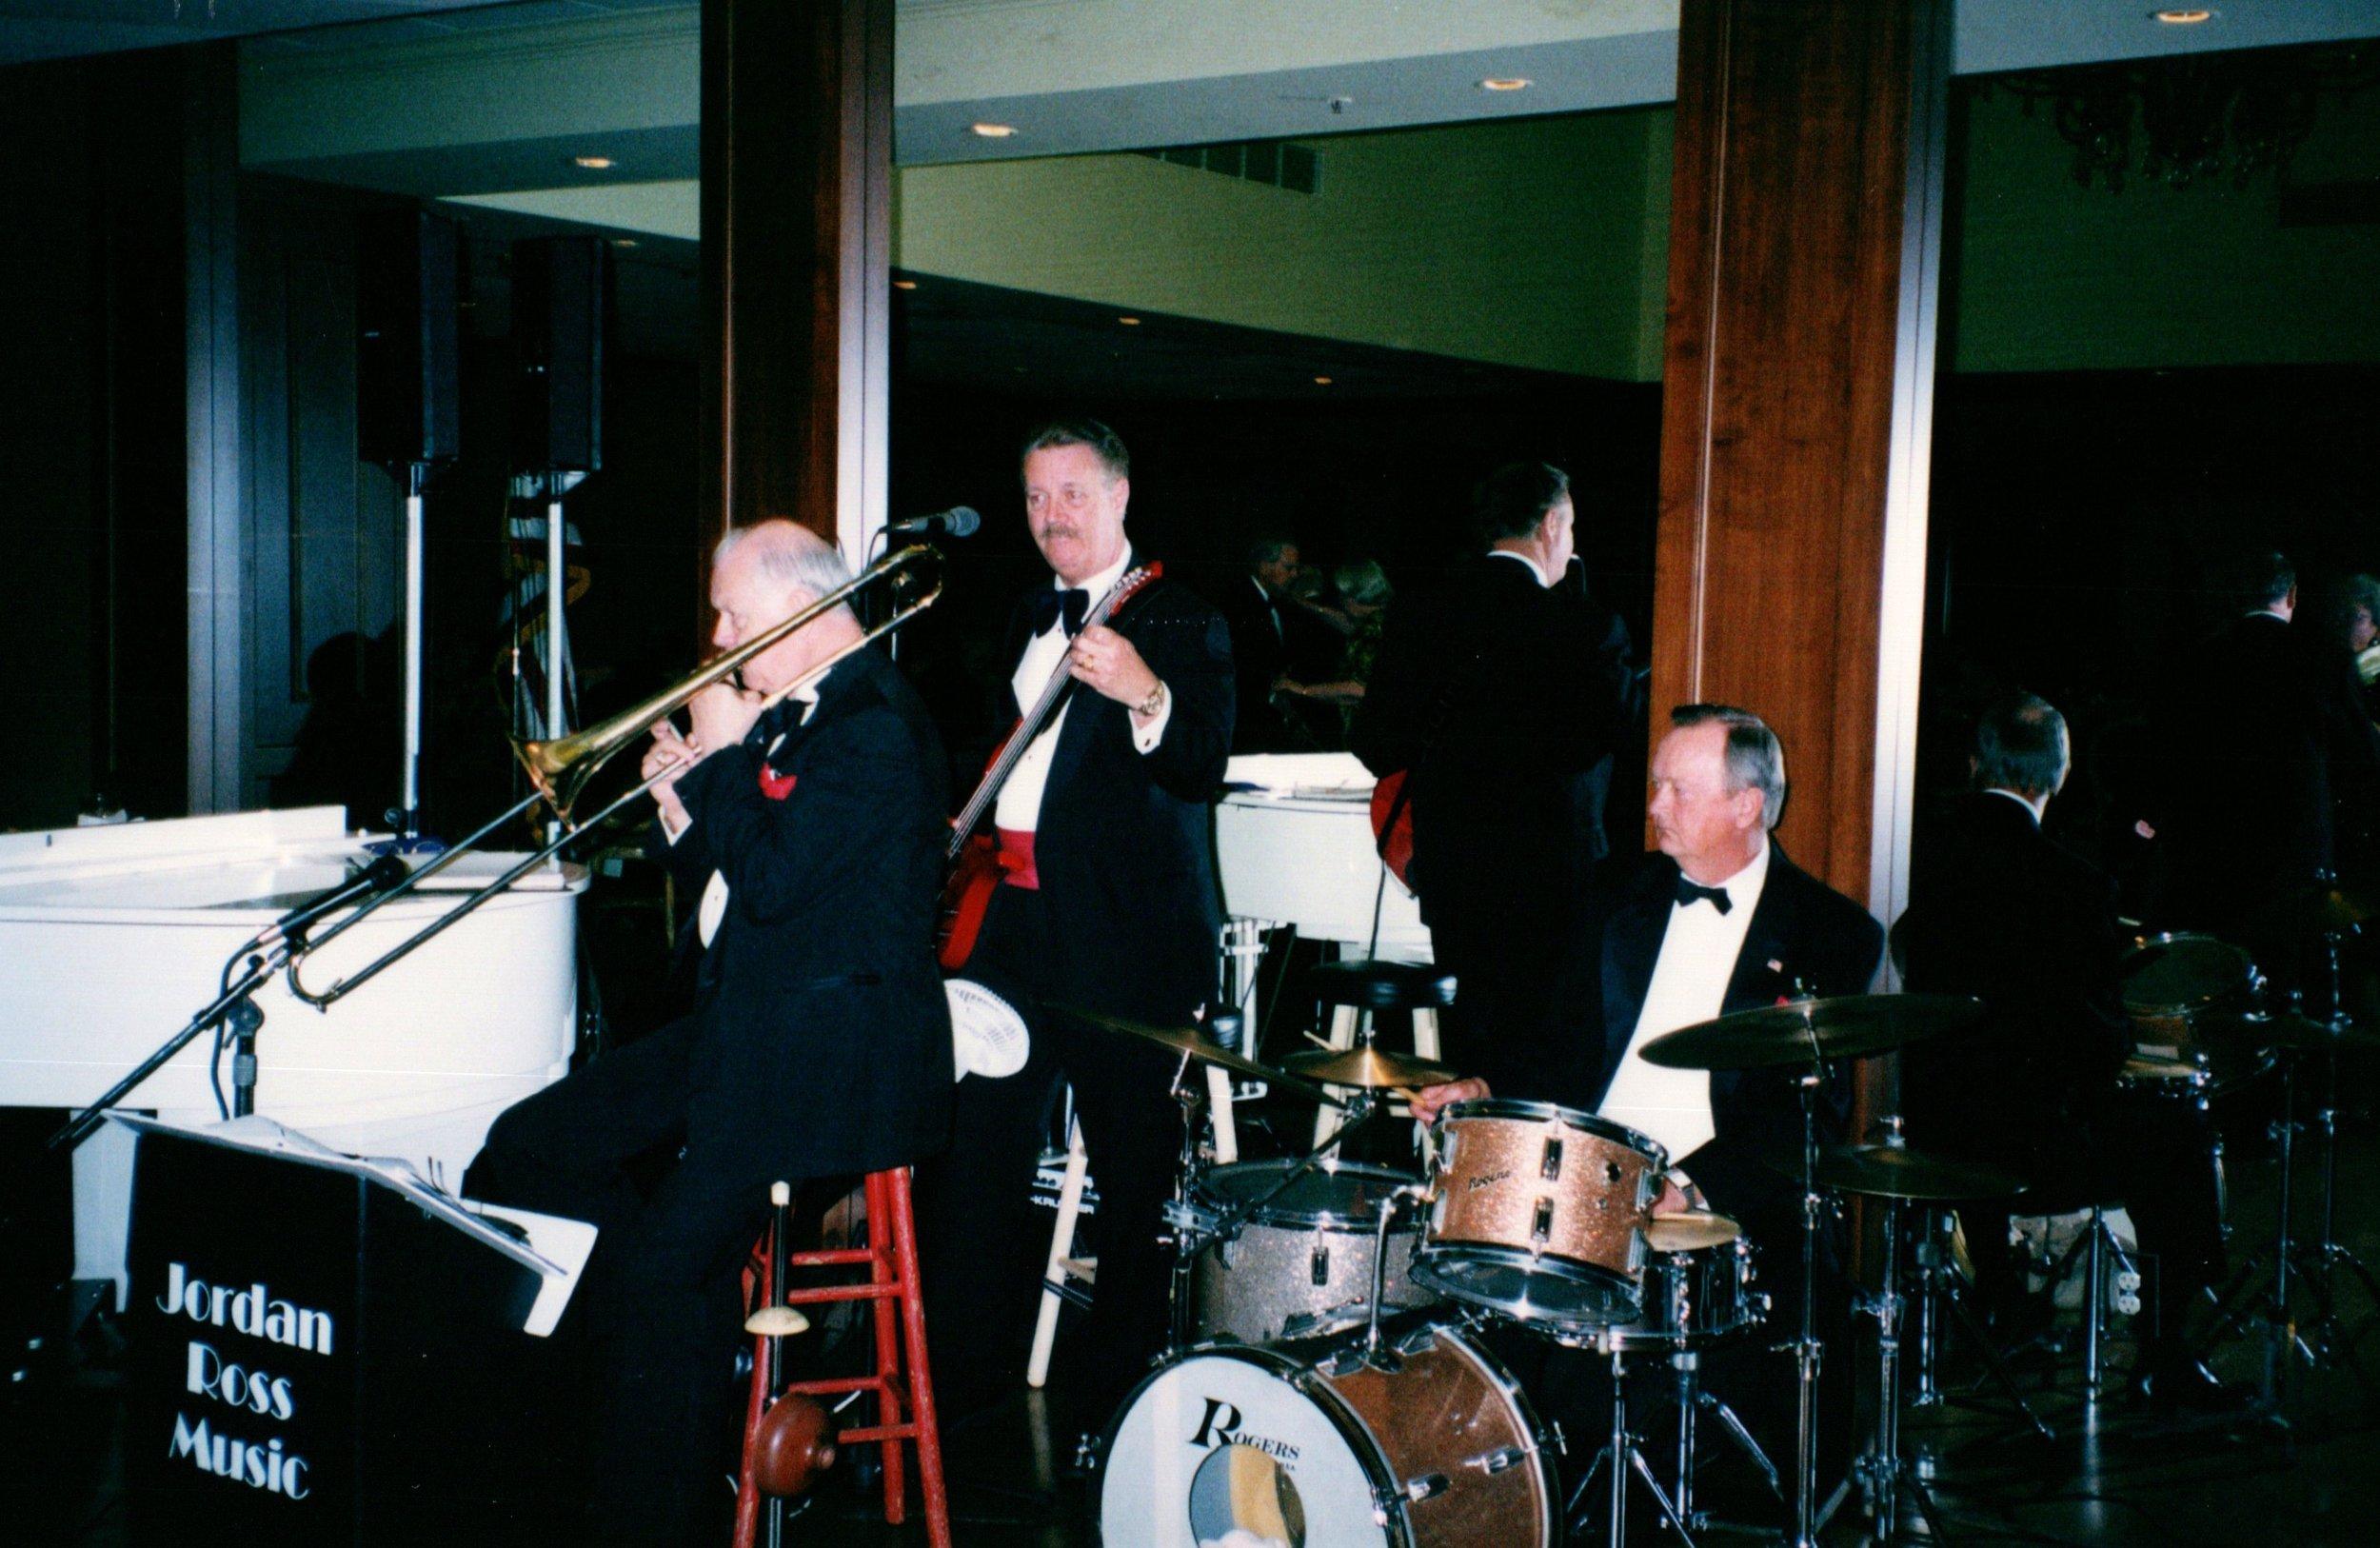 2_11_2002 - HYP DINNER DANCE - VINEYARD COUNTRY CLUB 17.jpg